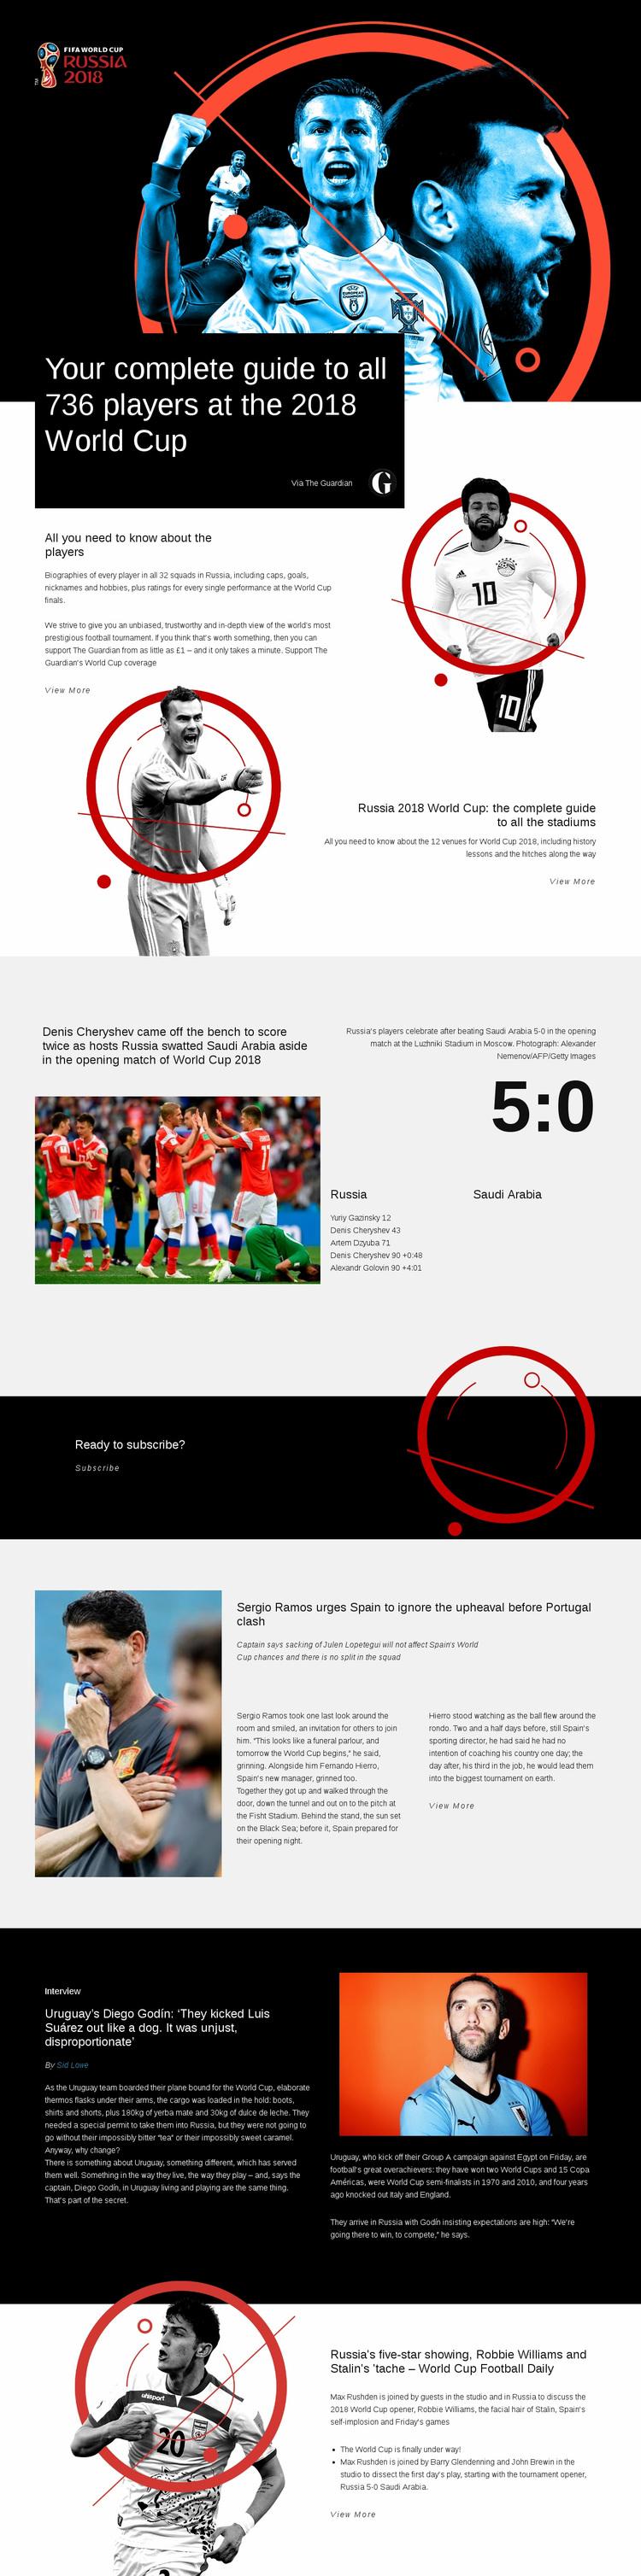 World Cup 2018 Website Design